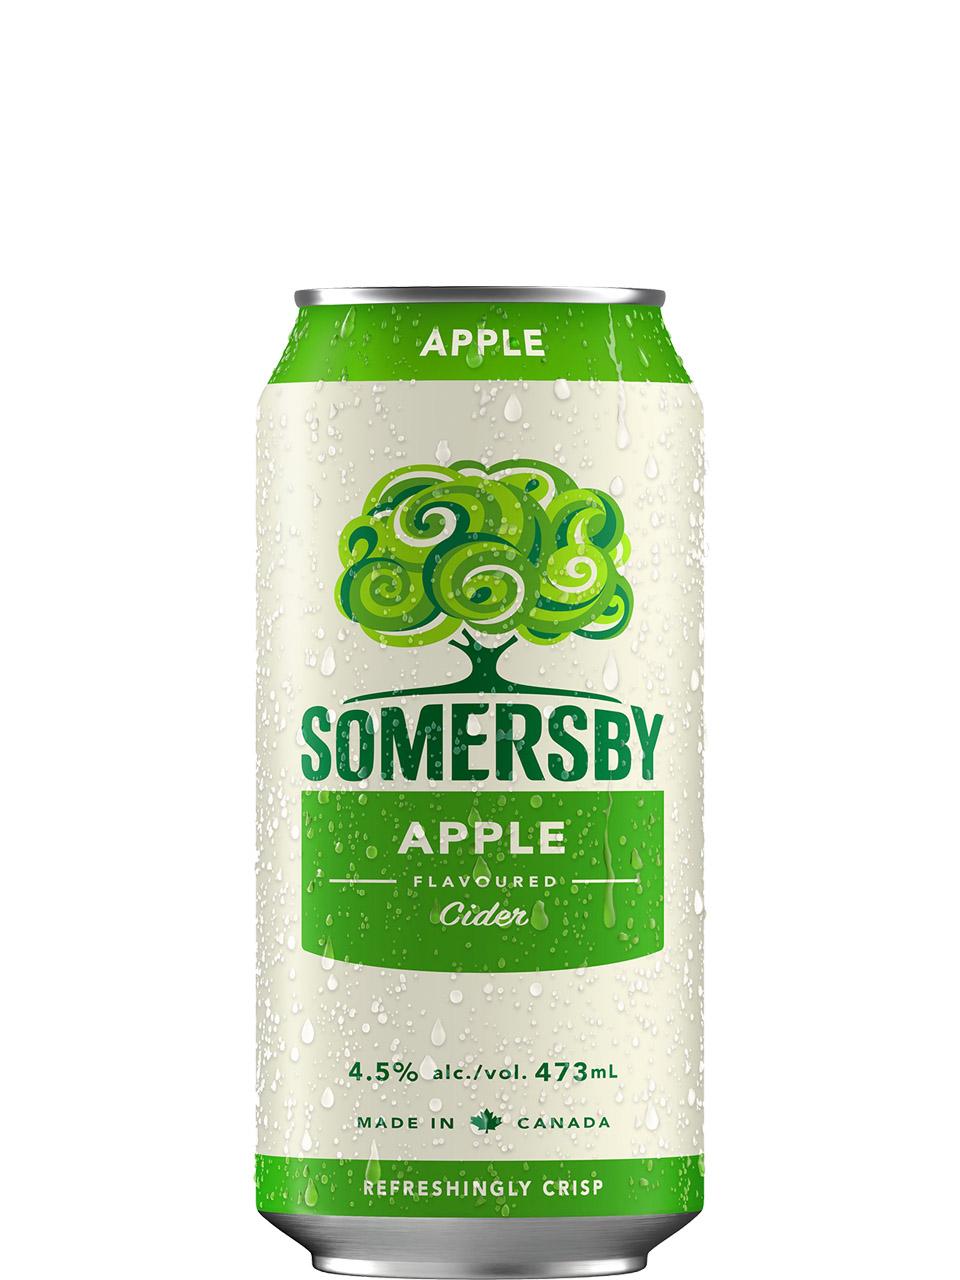 Somersby Apple Cider 473ml